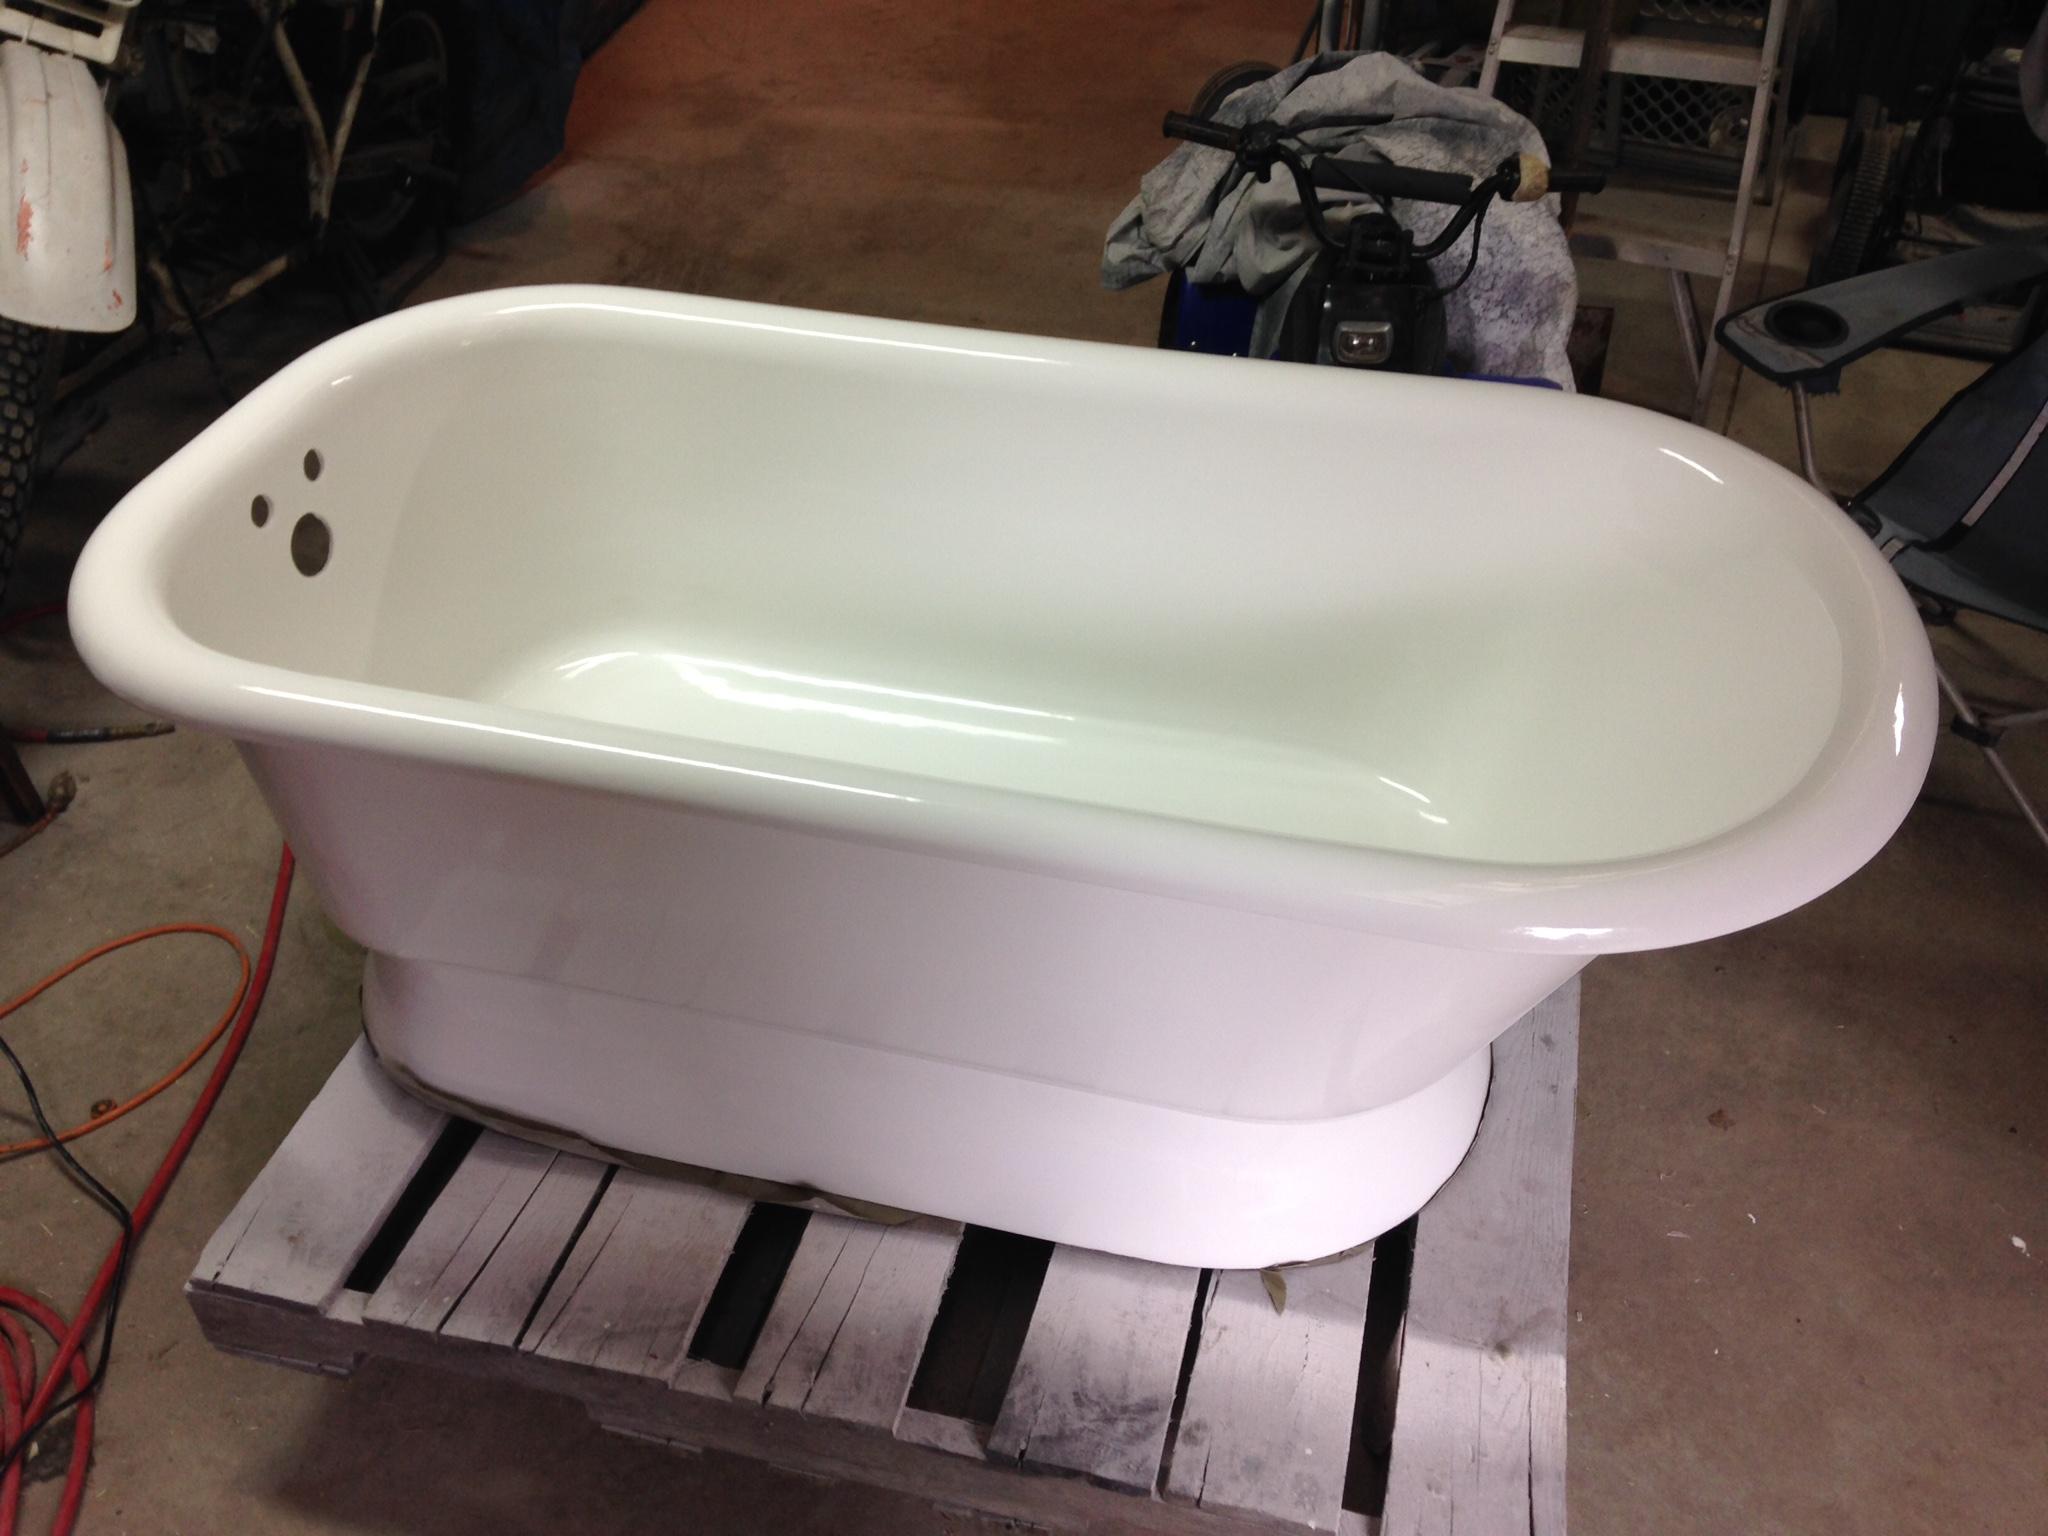 recoating bathtubs 28 images recoating bathtub 28 images bath recoat in west rand ingenious. Black Bedroom Furniture Sets. Home Design Ideas